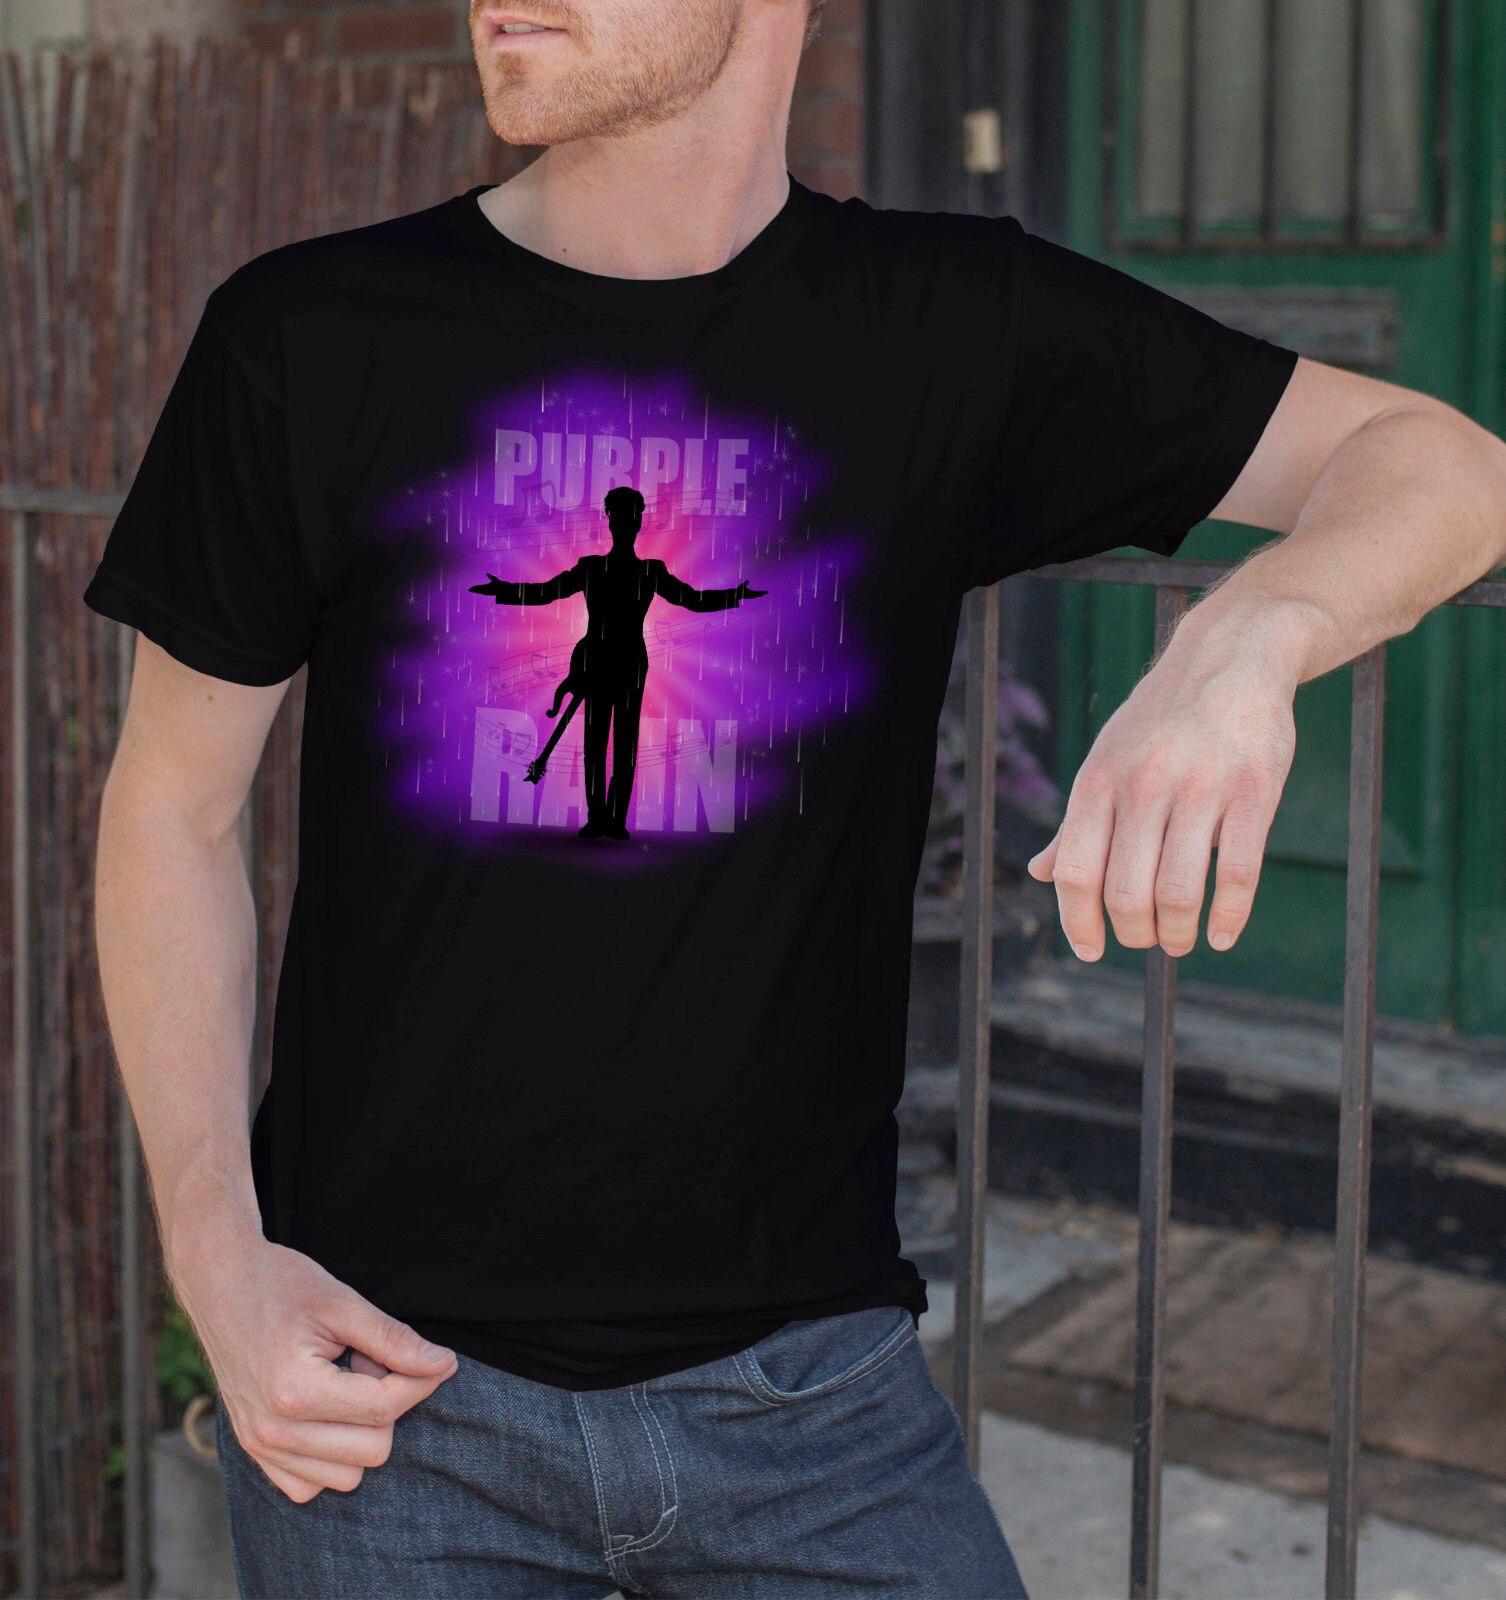 Prince R.I.P Graphic Men Black T-Shirt Purple Rain Rock Legend Tee Size S-3XL Men T Shirt 2018 Fashion Top Tee